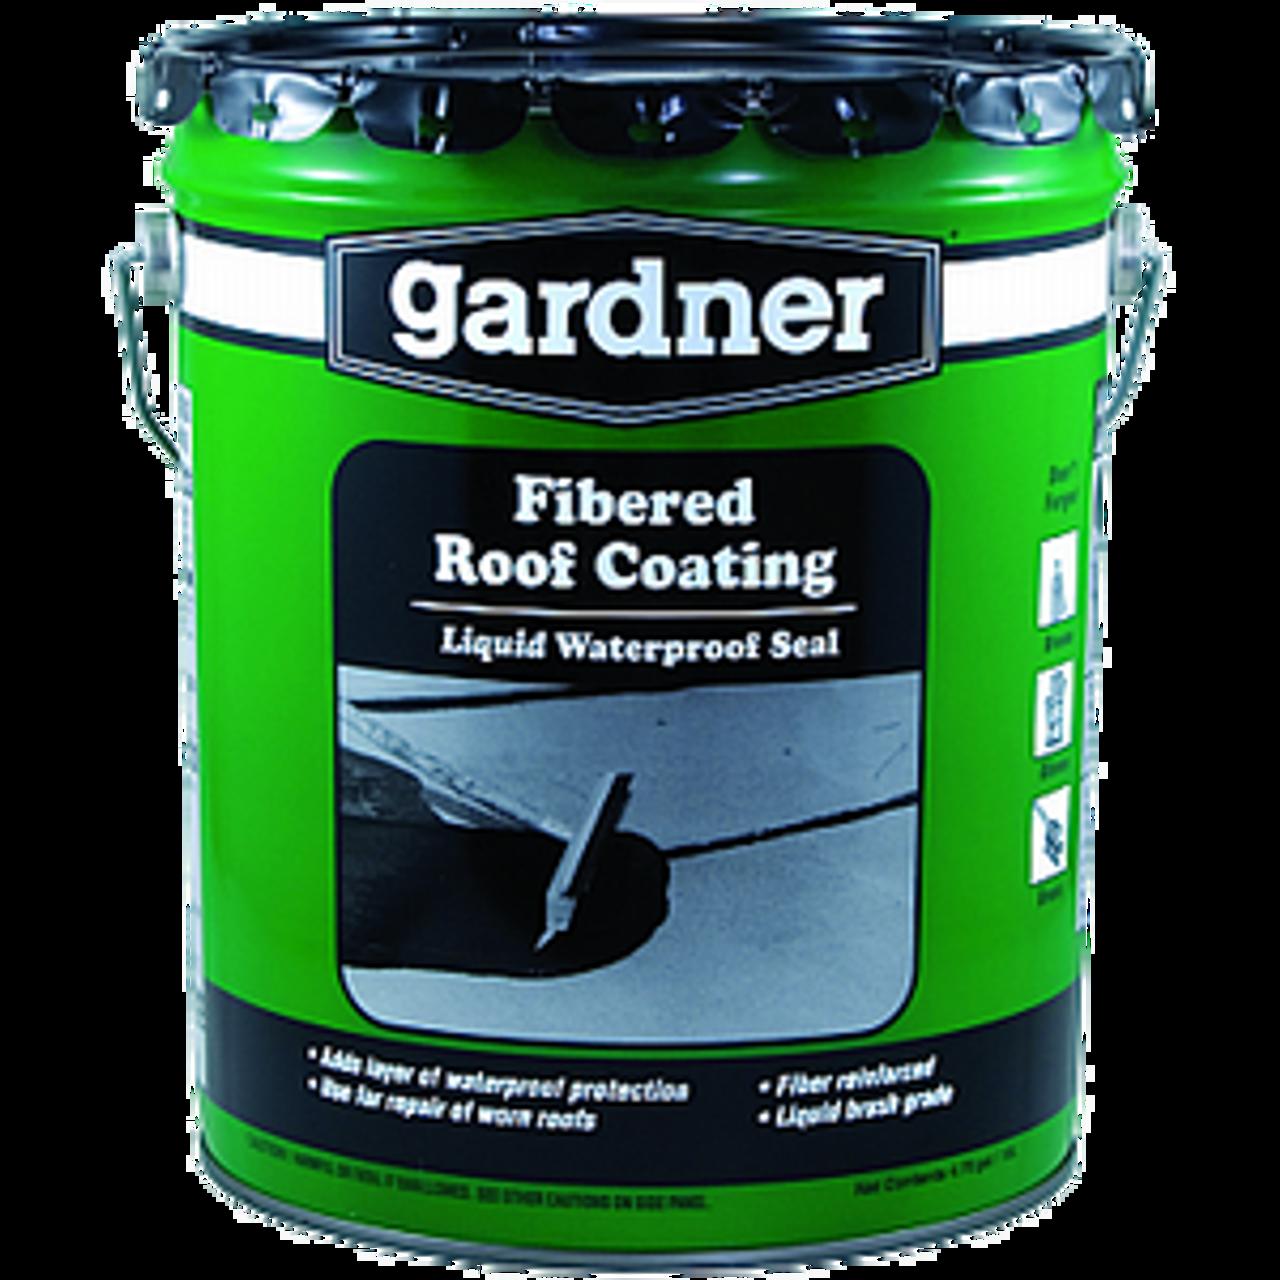 GARDNER GIBSON 0105-GA 5G BLACK FIBERED ROOF COATING